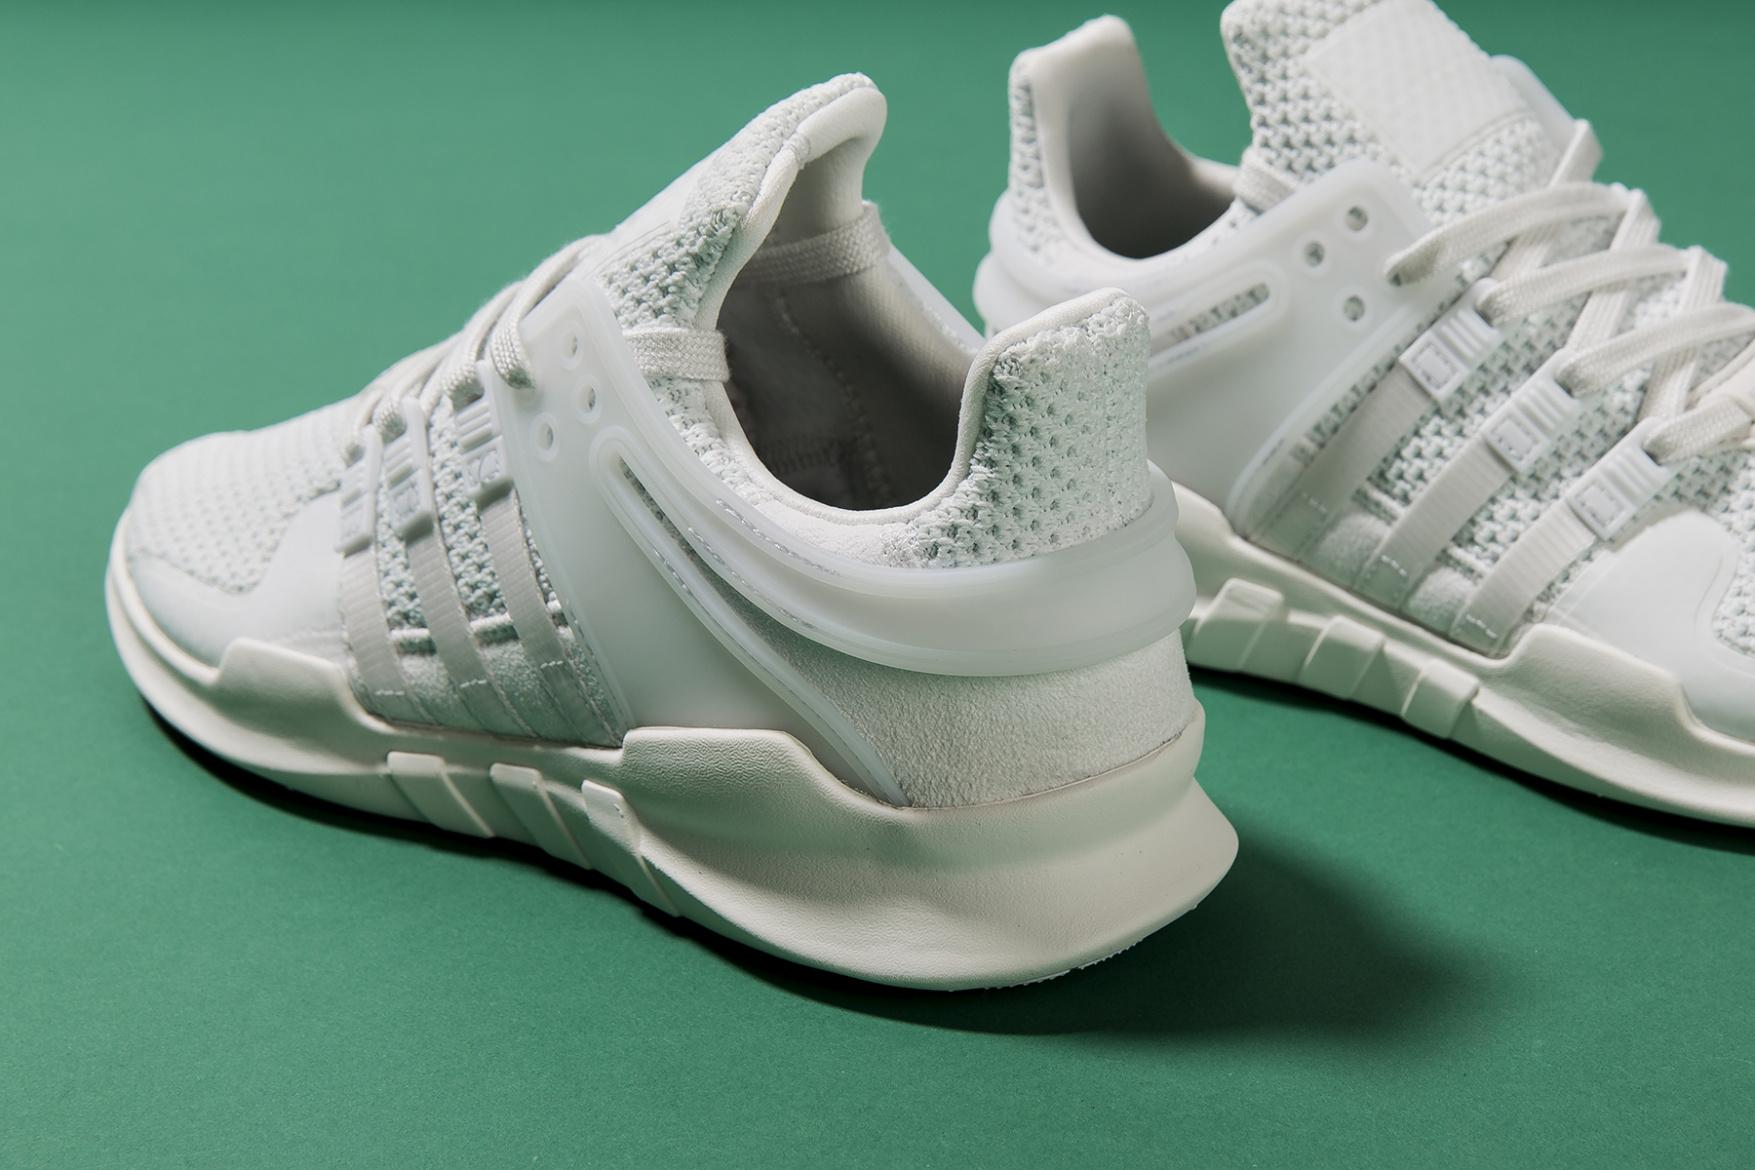 adidas-eqt-support-adv-vintage-white-3.jpg